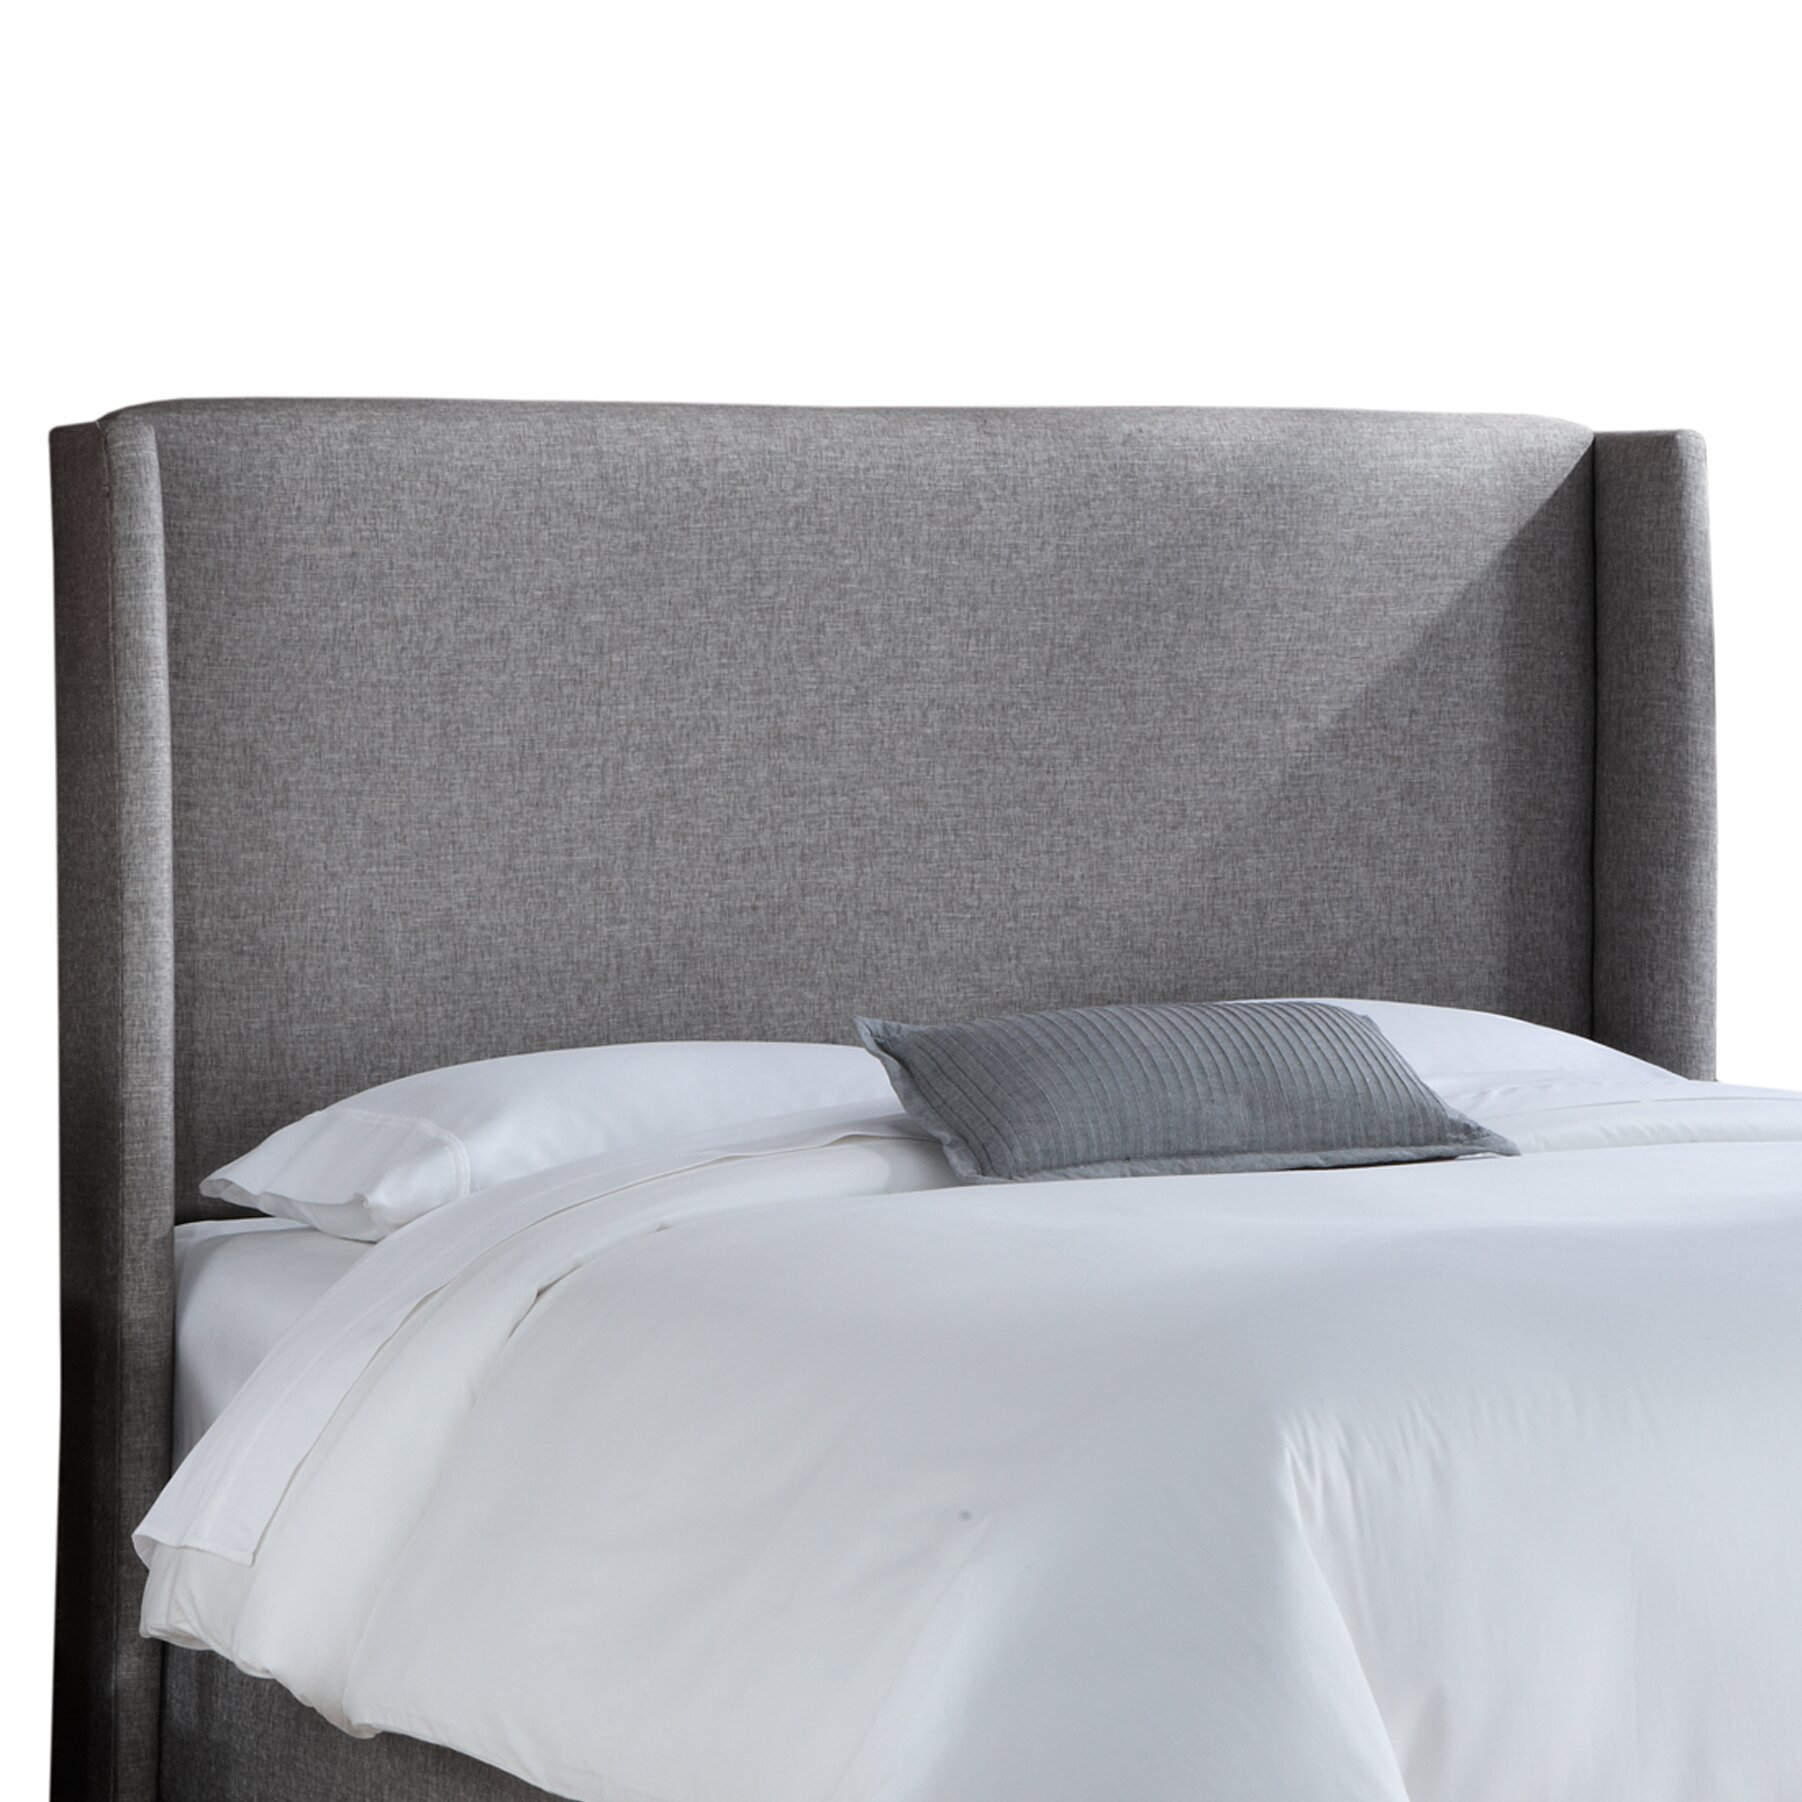 skyline furniture wingback upholstered headboard  reviews  wayfair, Headboard designs